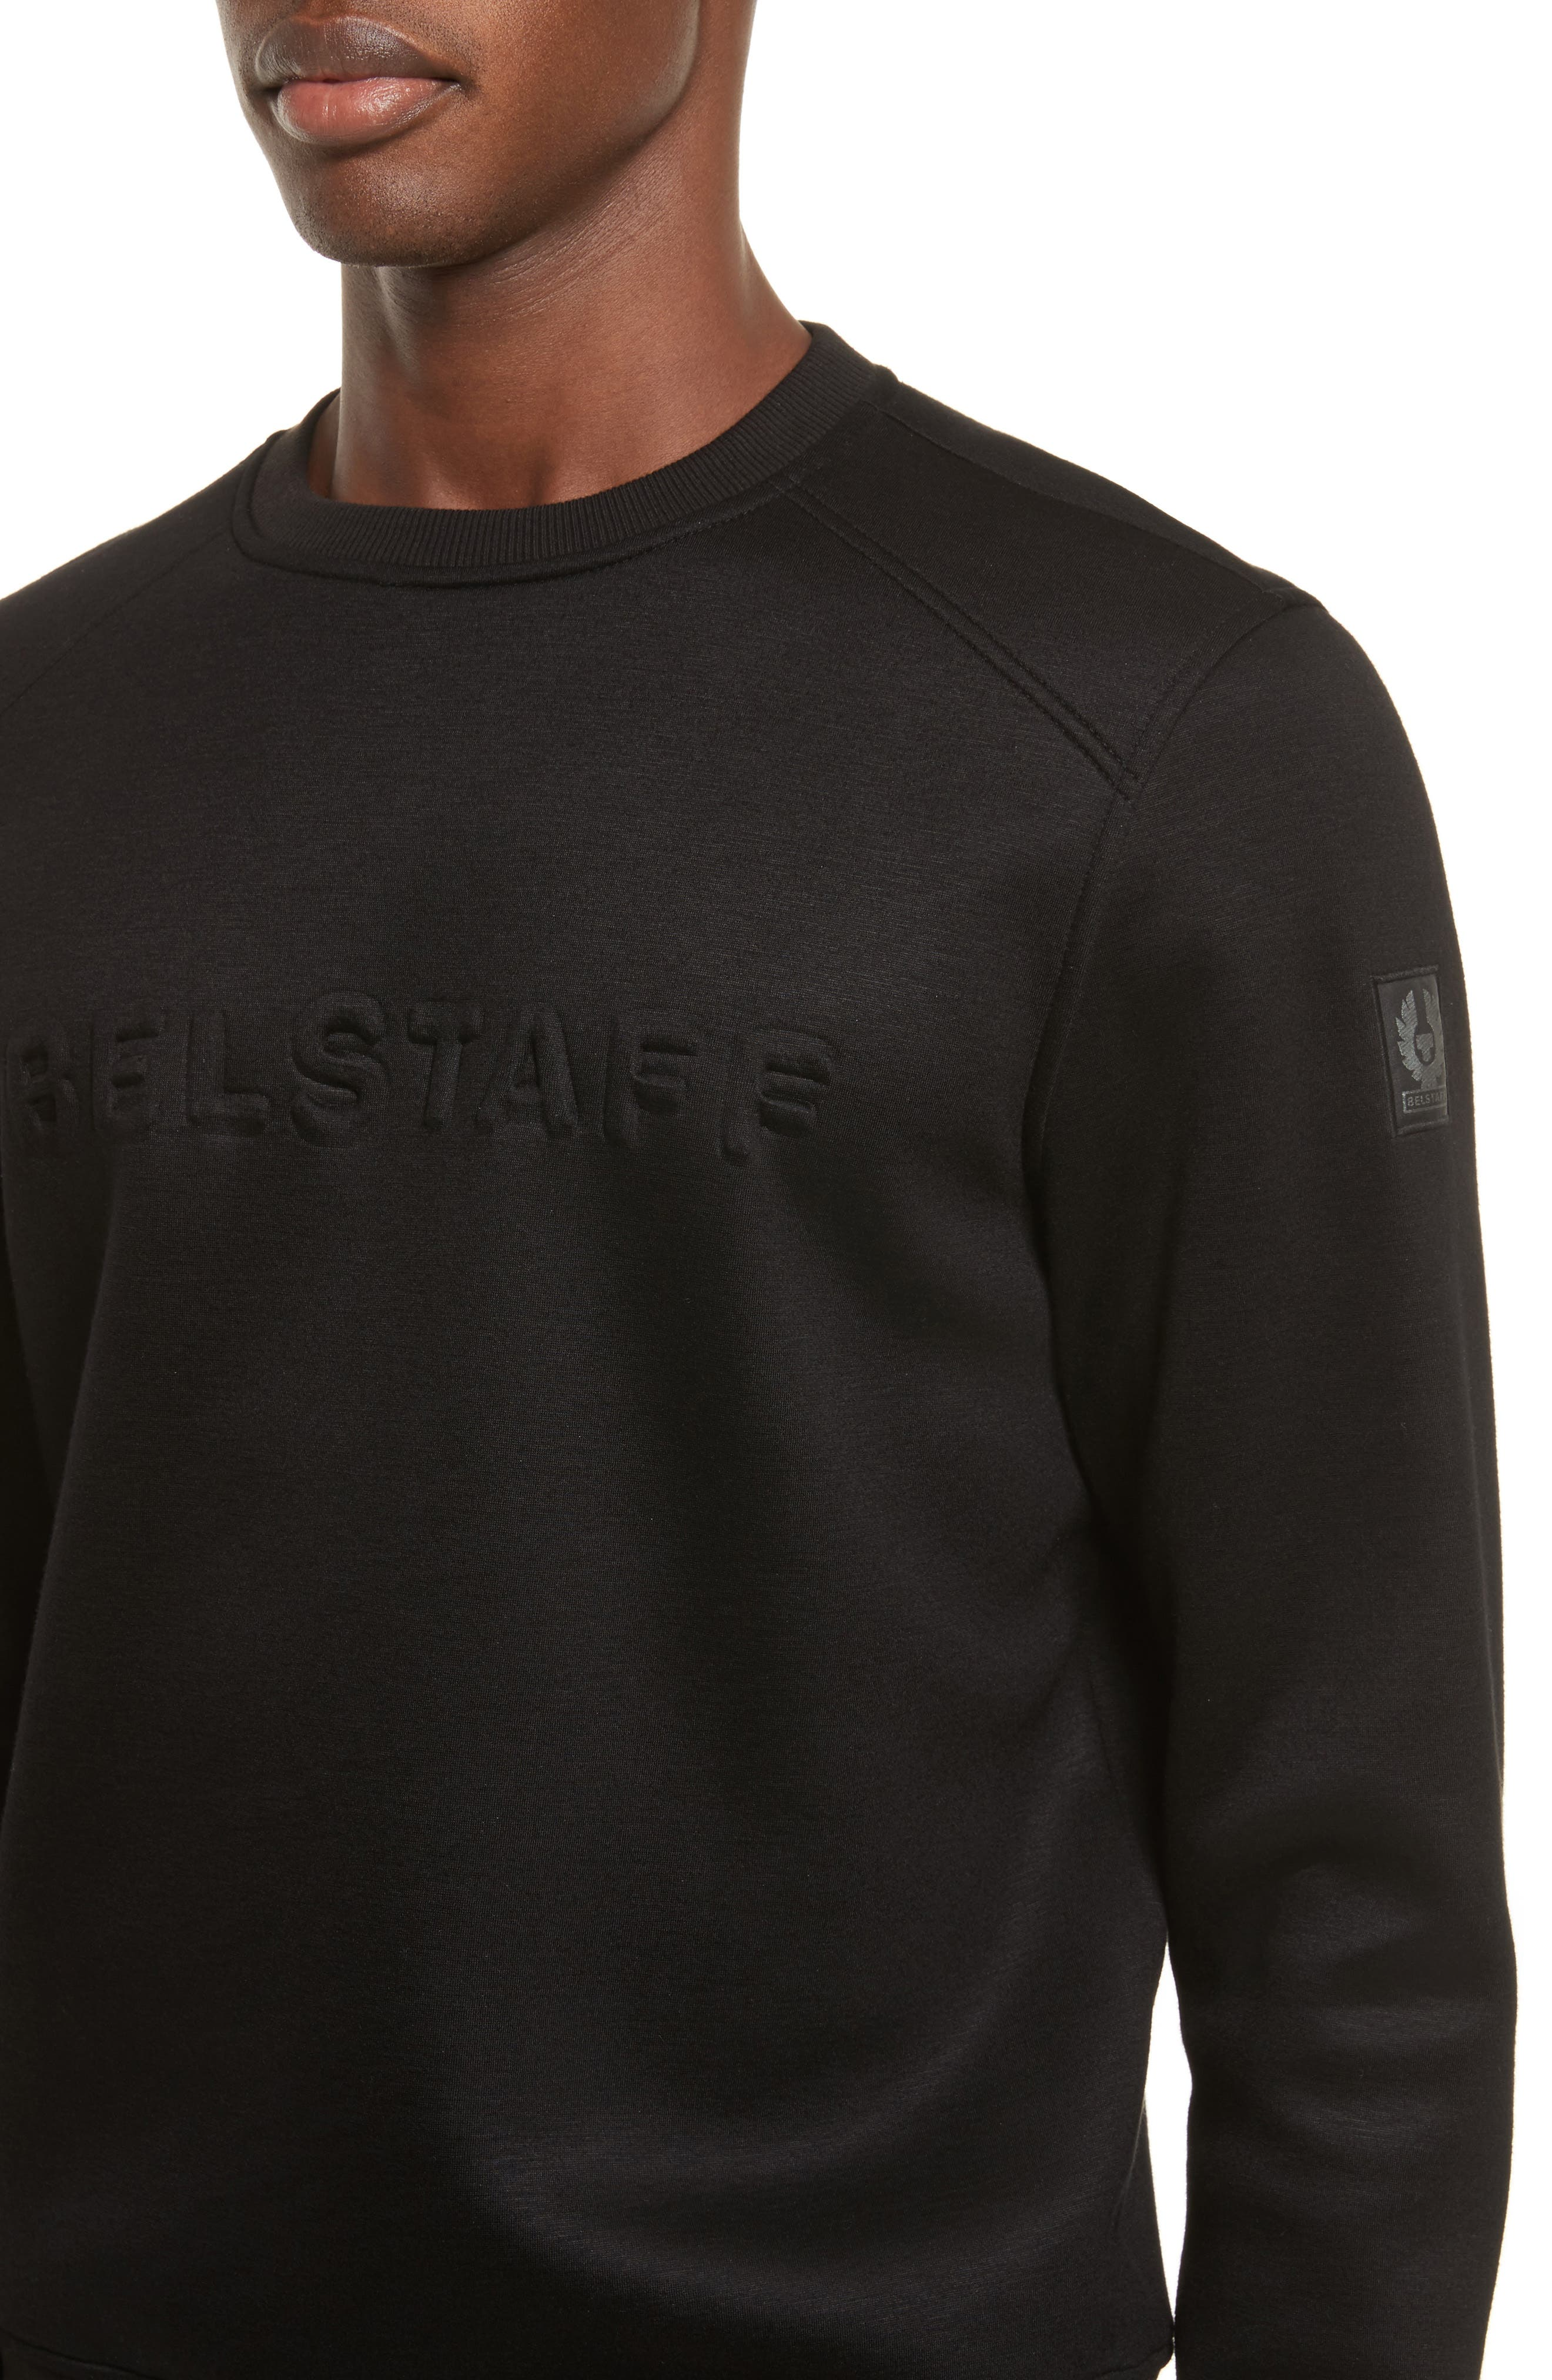 Belsford Crewneck Sweatshirt,                             Alternate thumbnail 4, color,                             Black